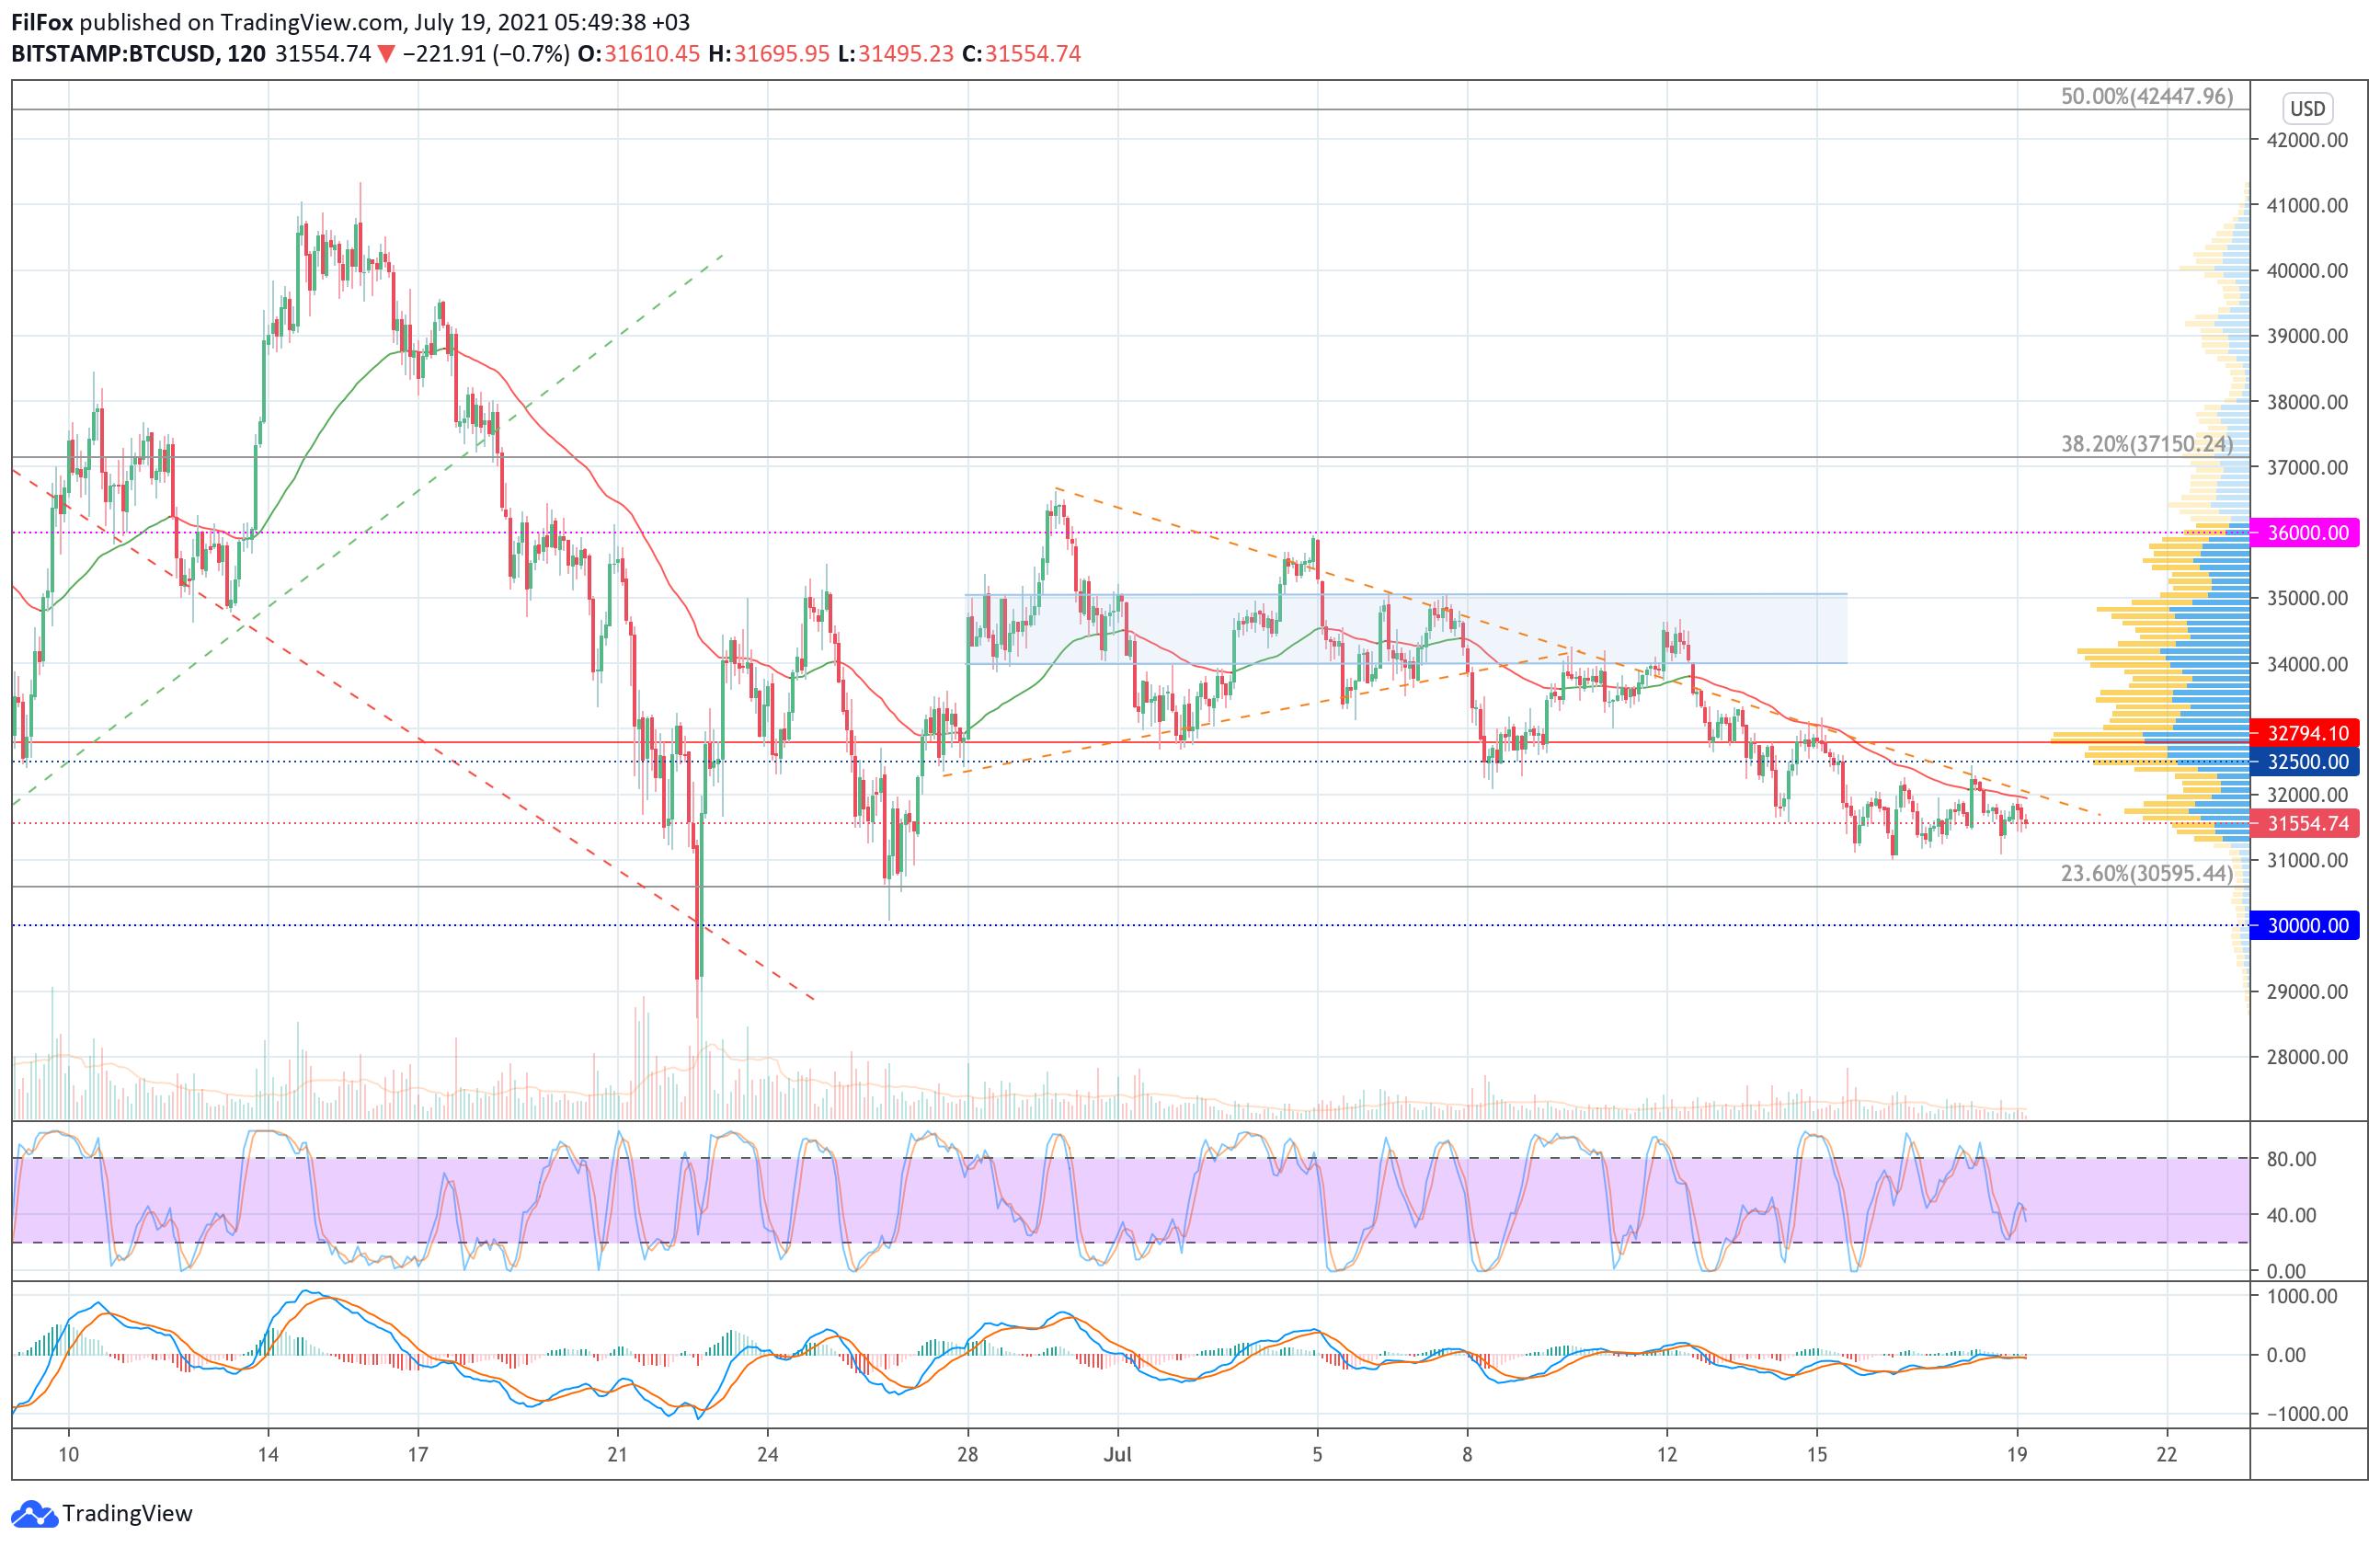 Анализ цен Bitcoin, Ethereum, XRP на 19.07.2021